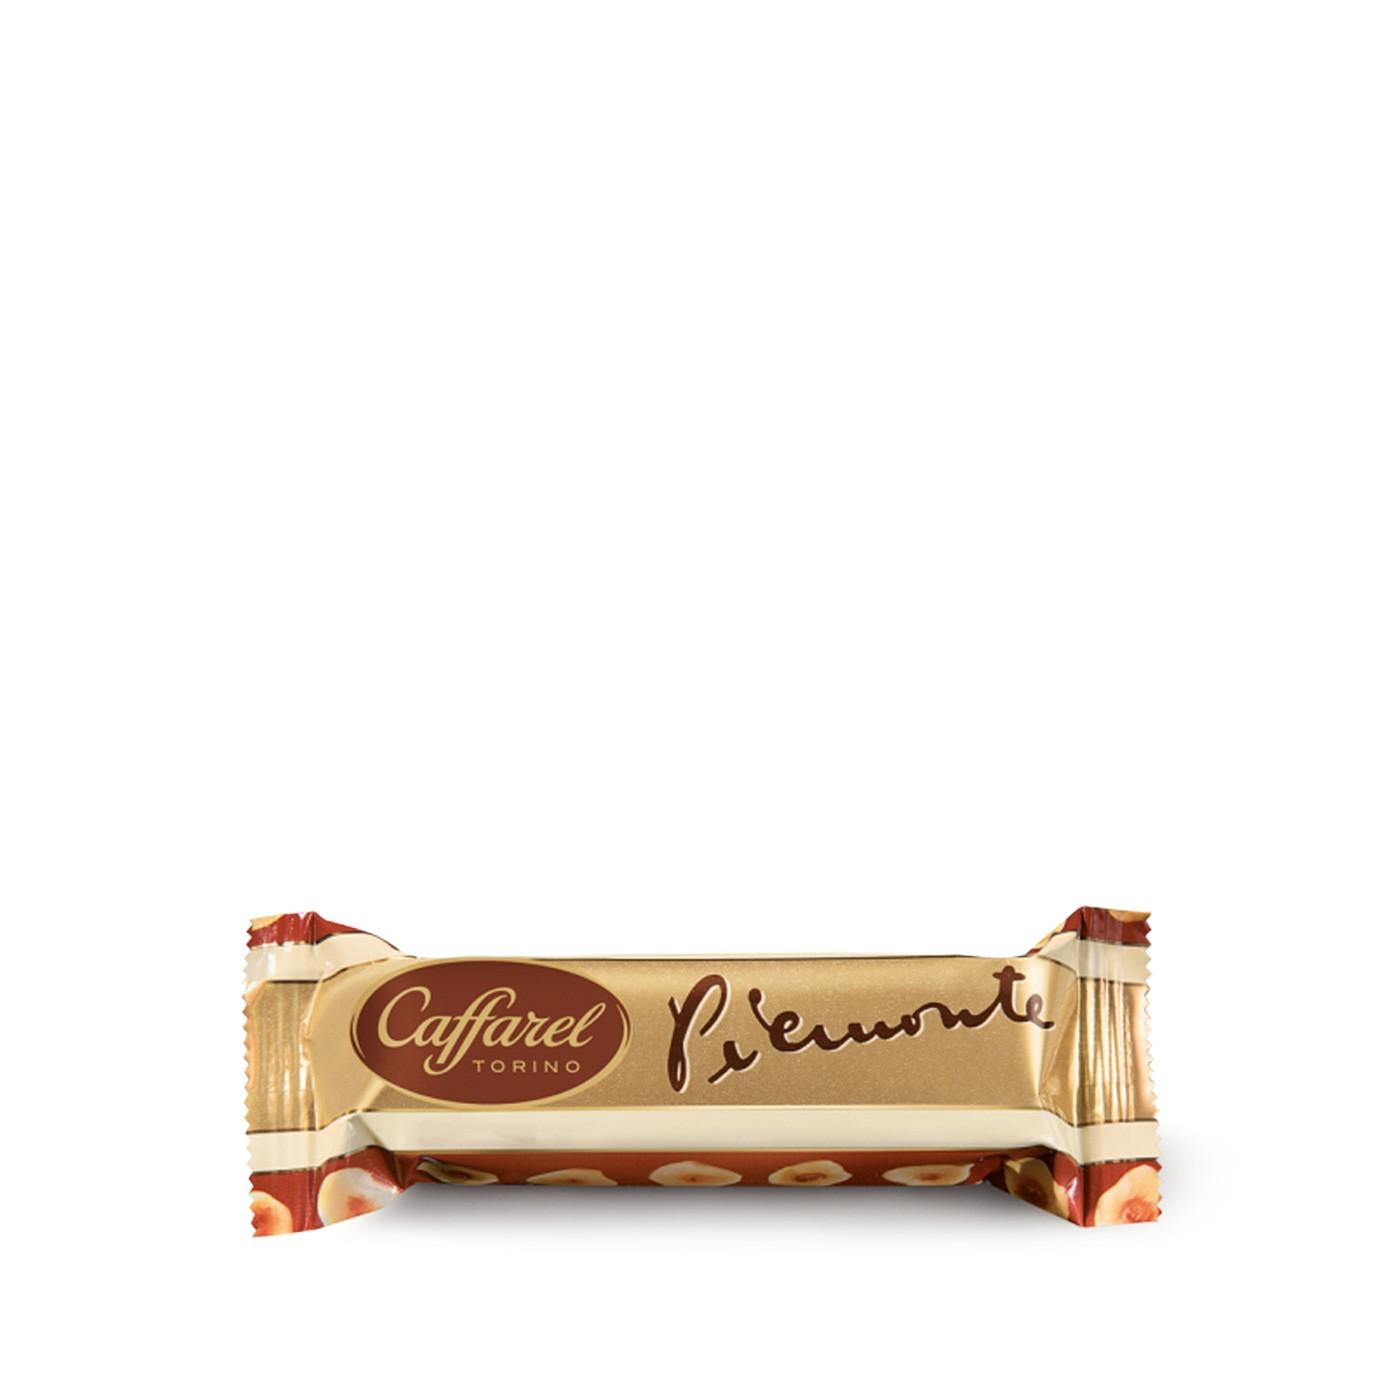 Mini Piemonte Chocolate Bar 1 oz